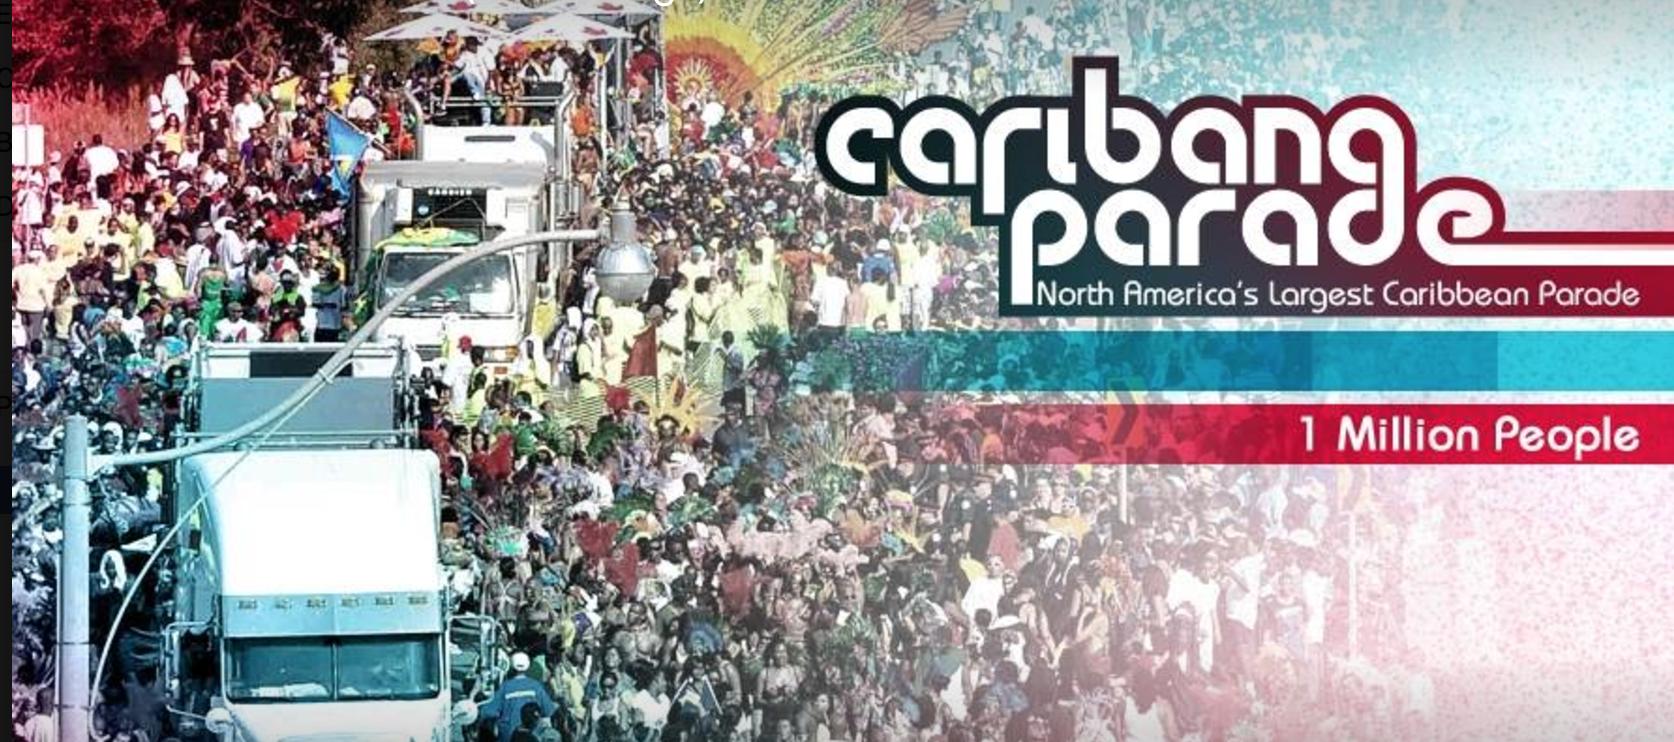 caribana-parade.jpg